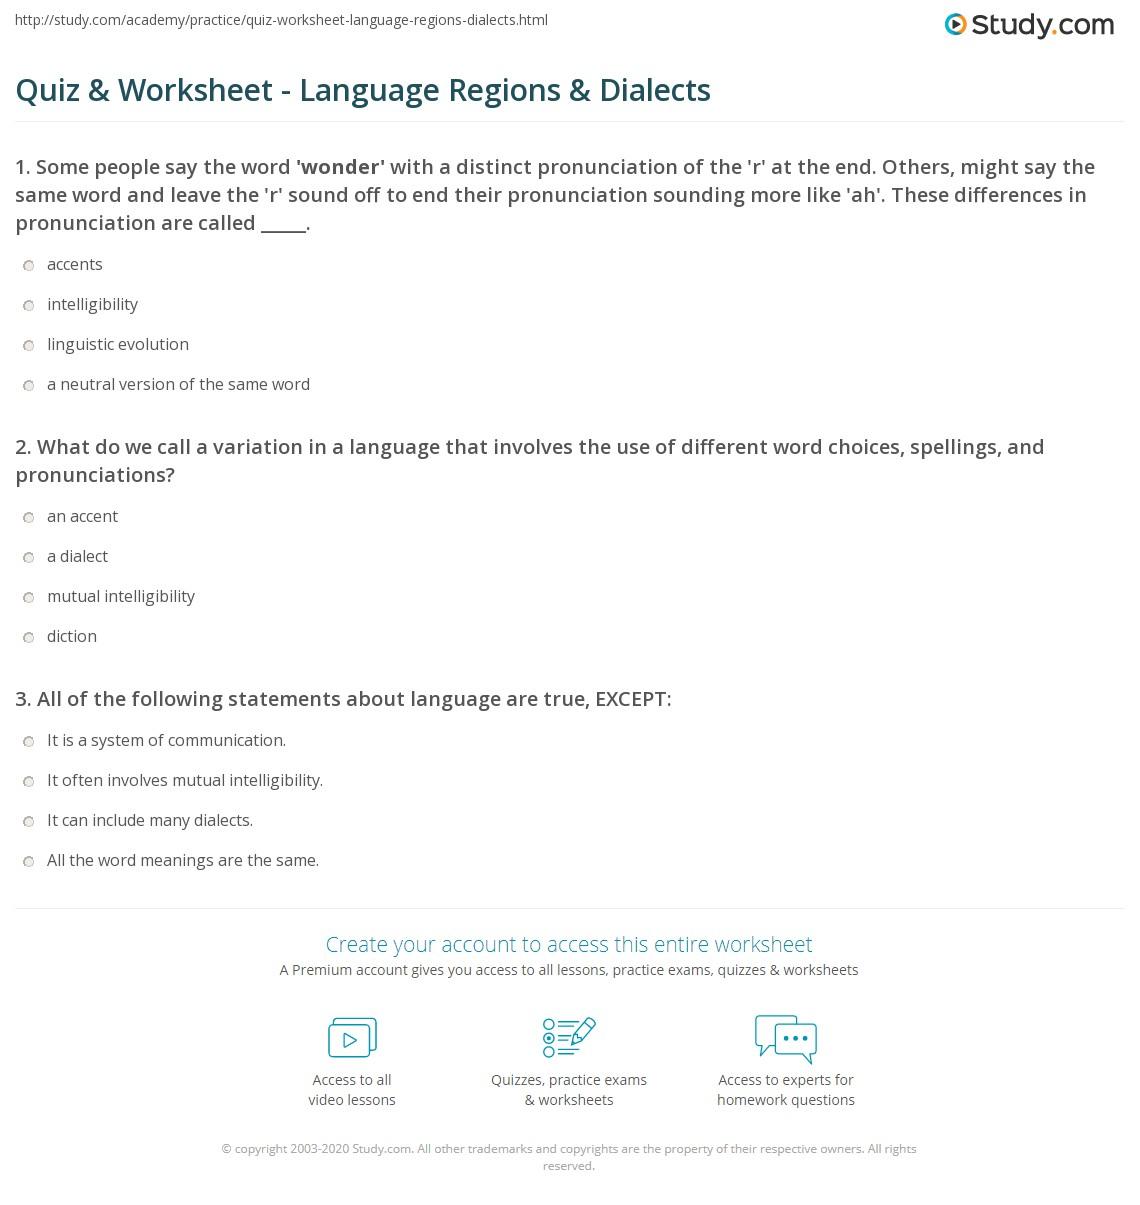 Quiz & Worksheet - Language Regions & Dialects | Study com